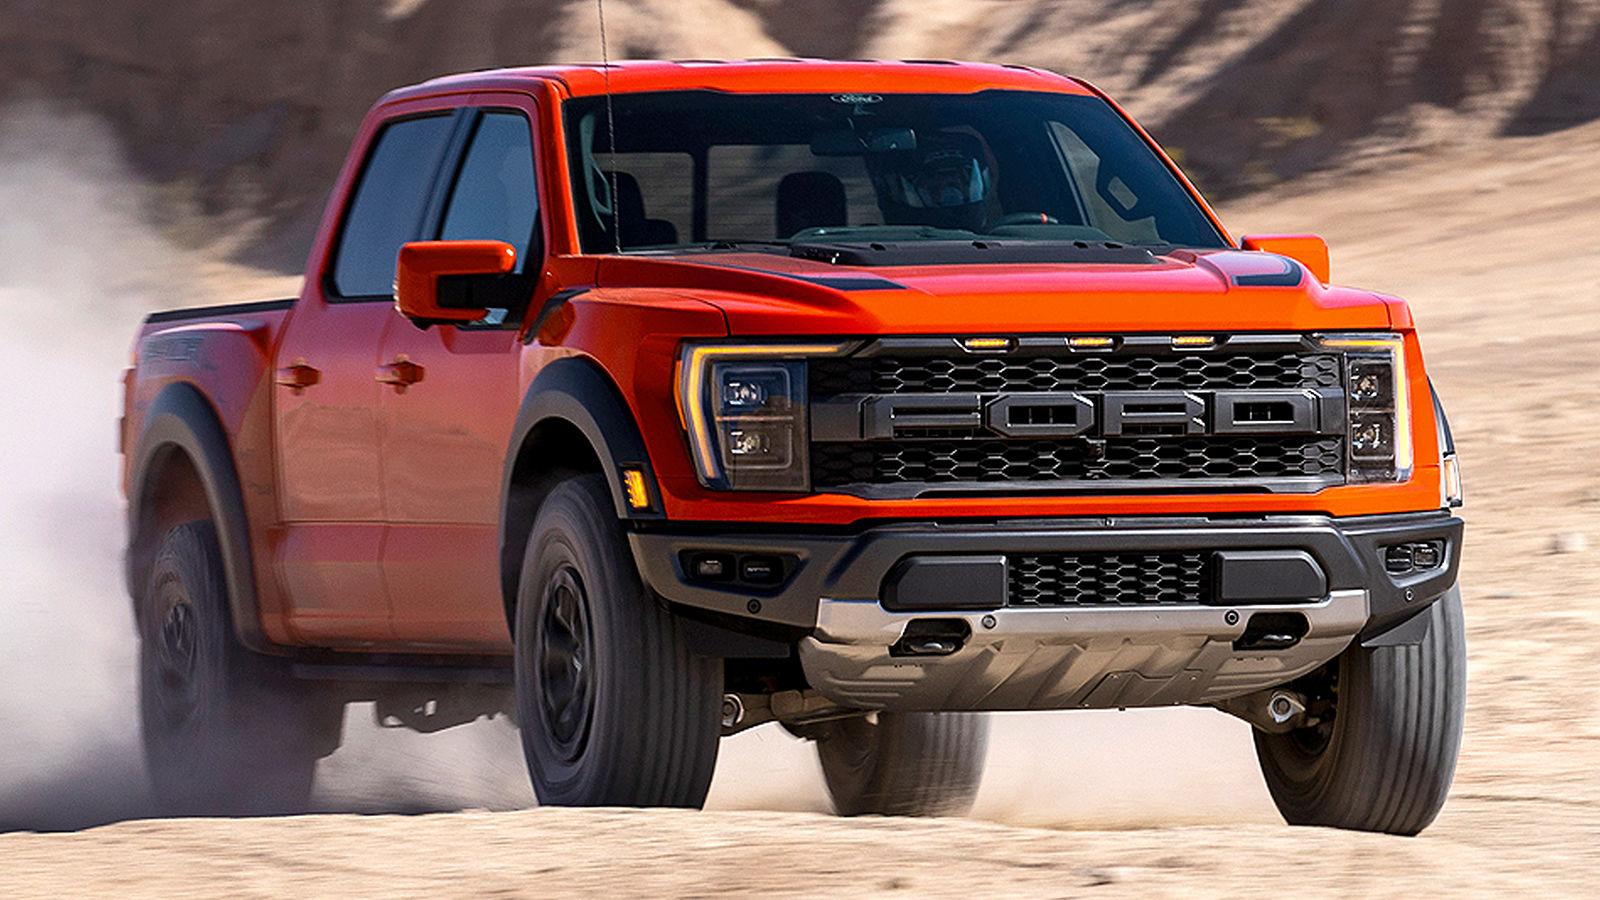 Ford F-150 Raptor (2021): Pick-up - Motor - Fahrwerk ...